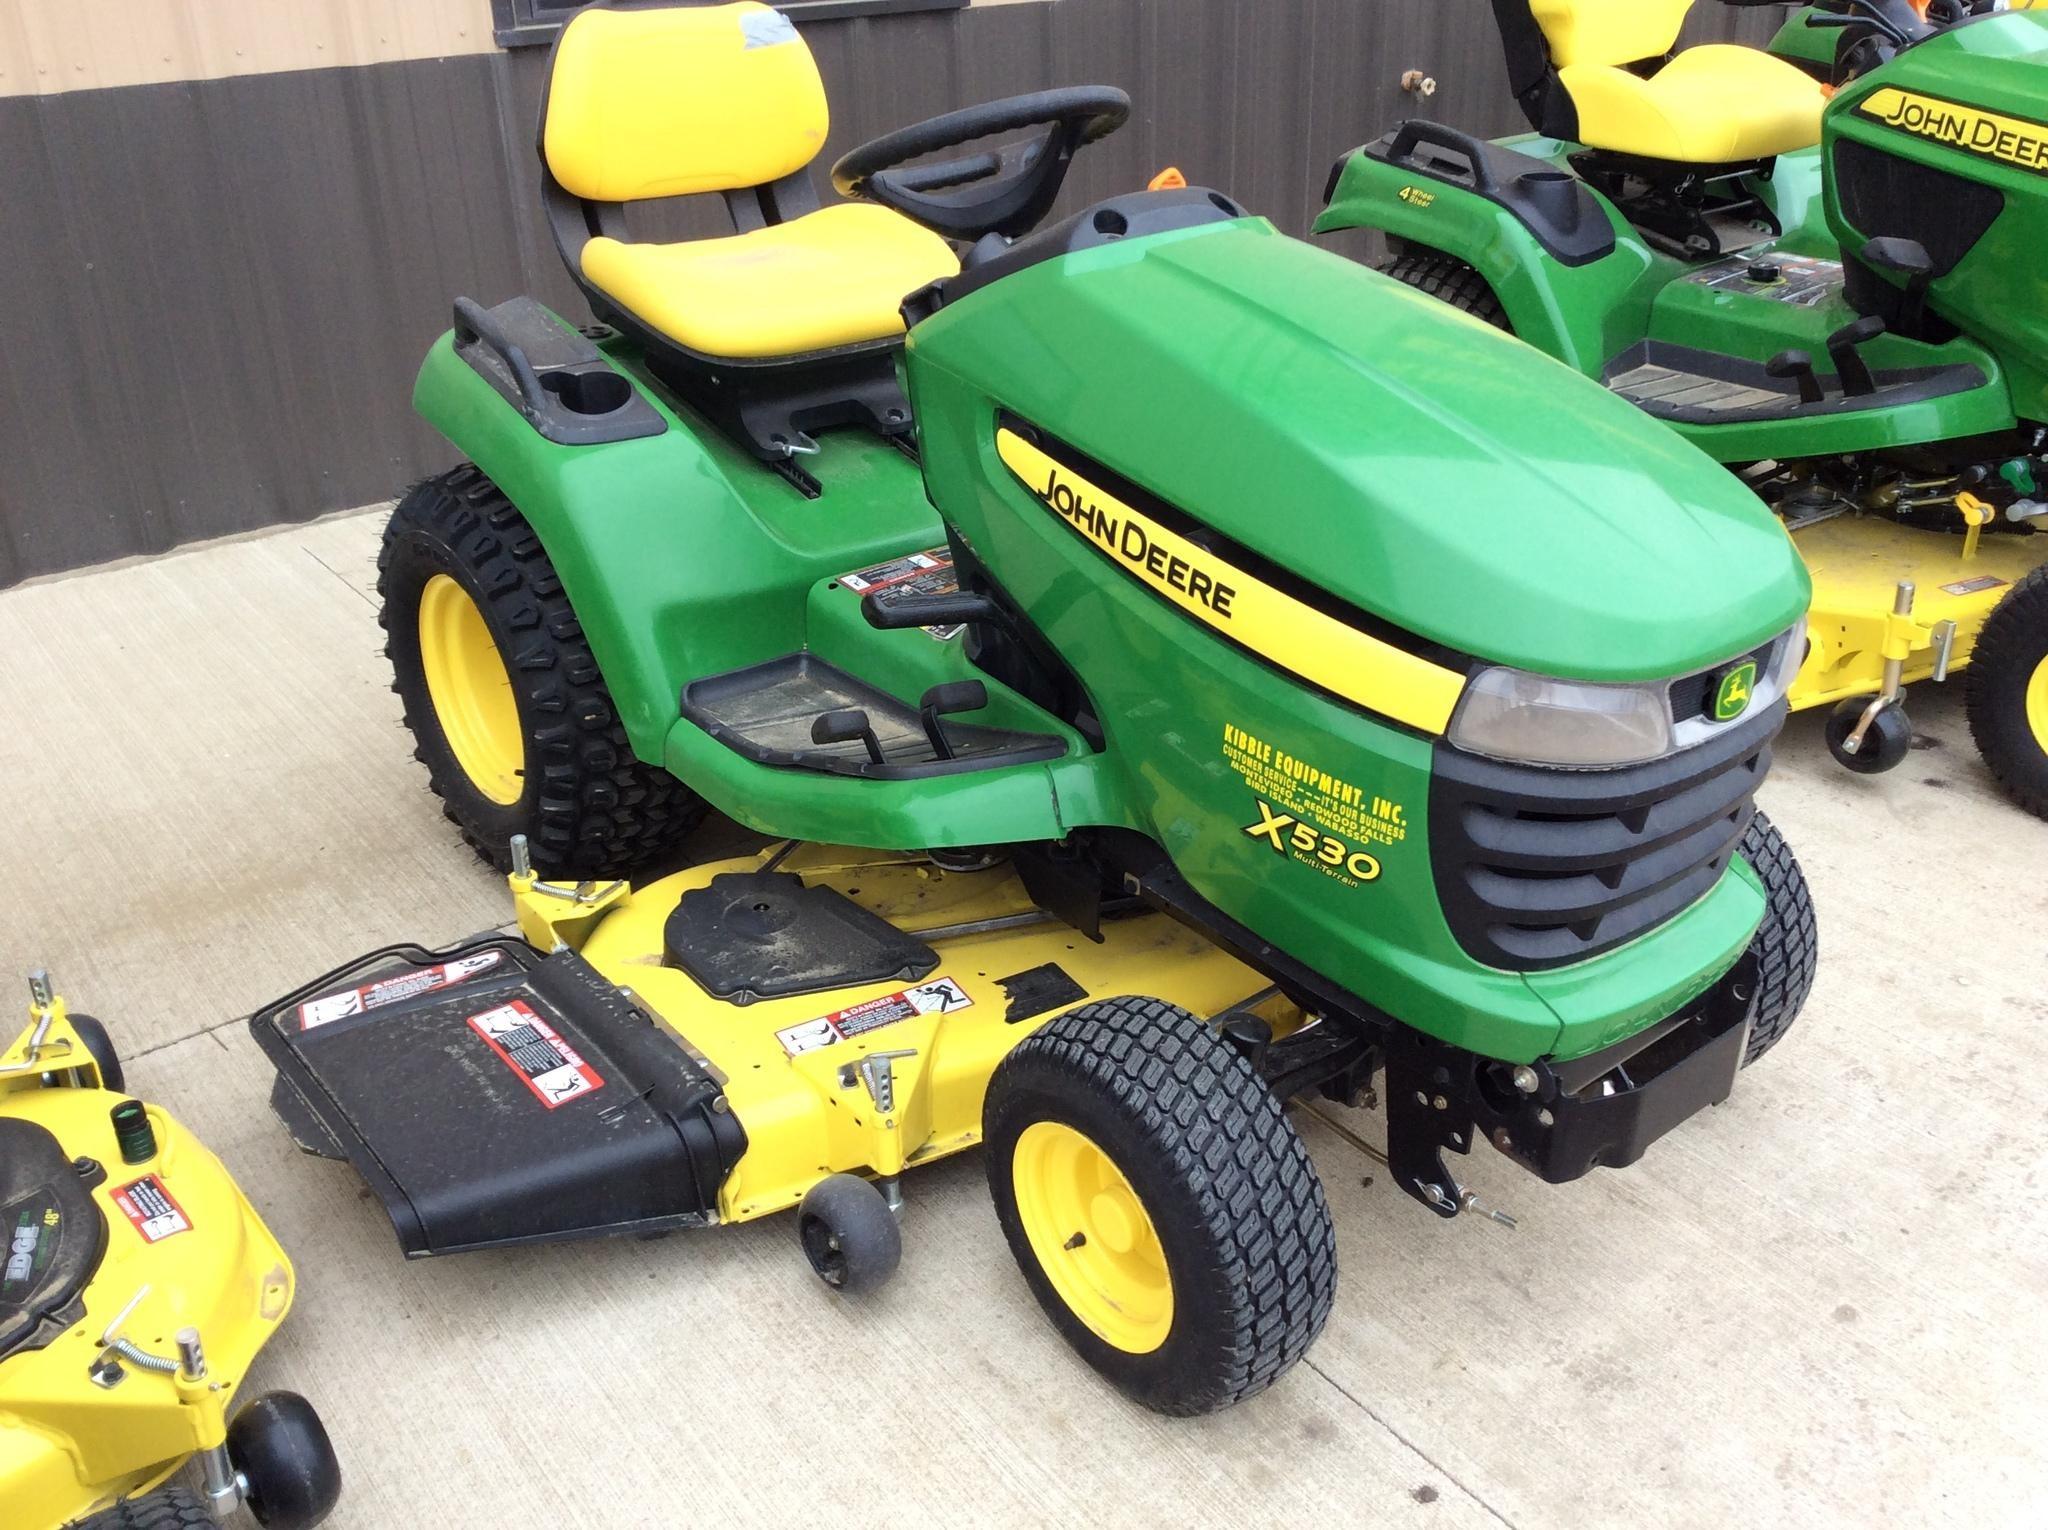 John Deere X530 Lawn Tractor : Wisconsin ag connection john deere riding lawn